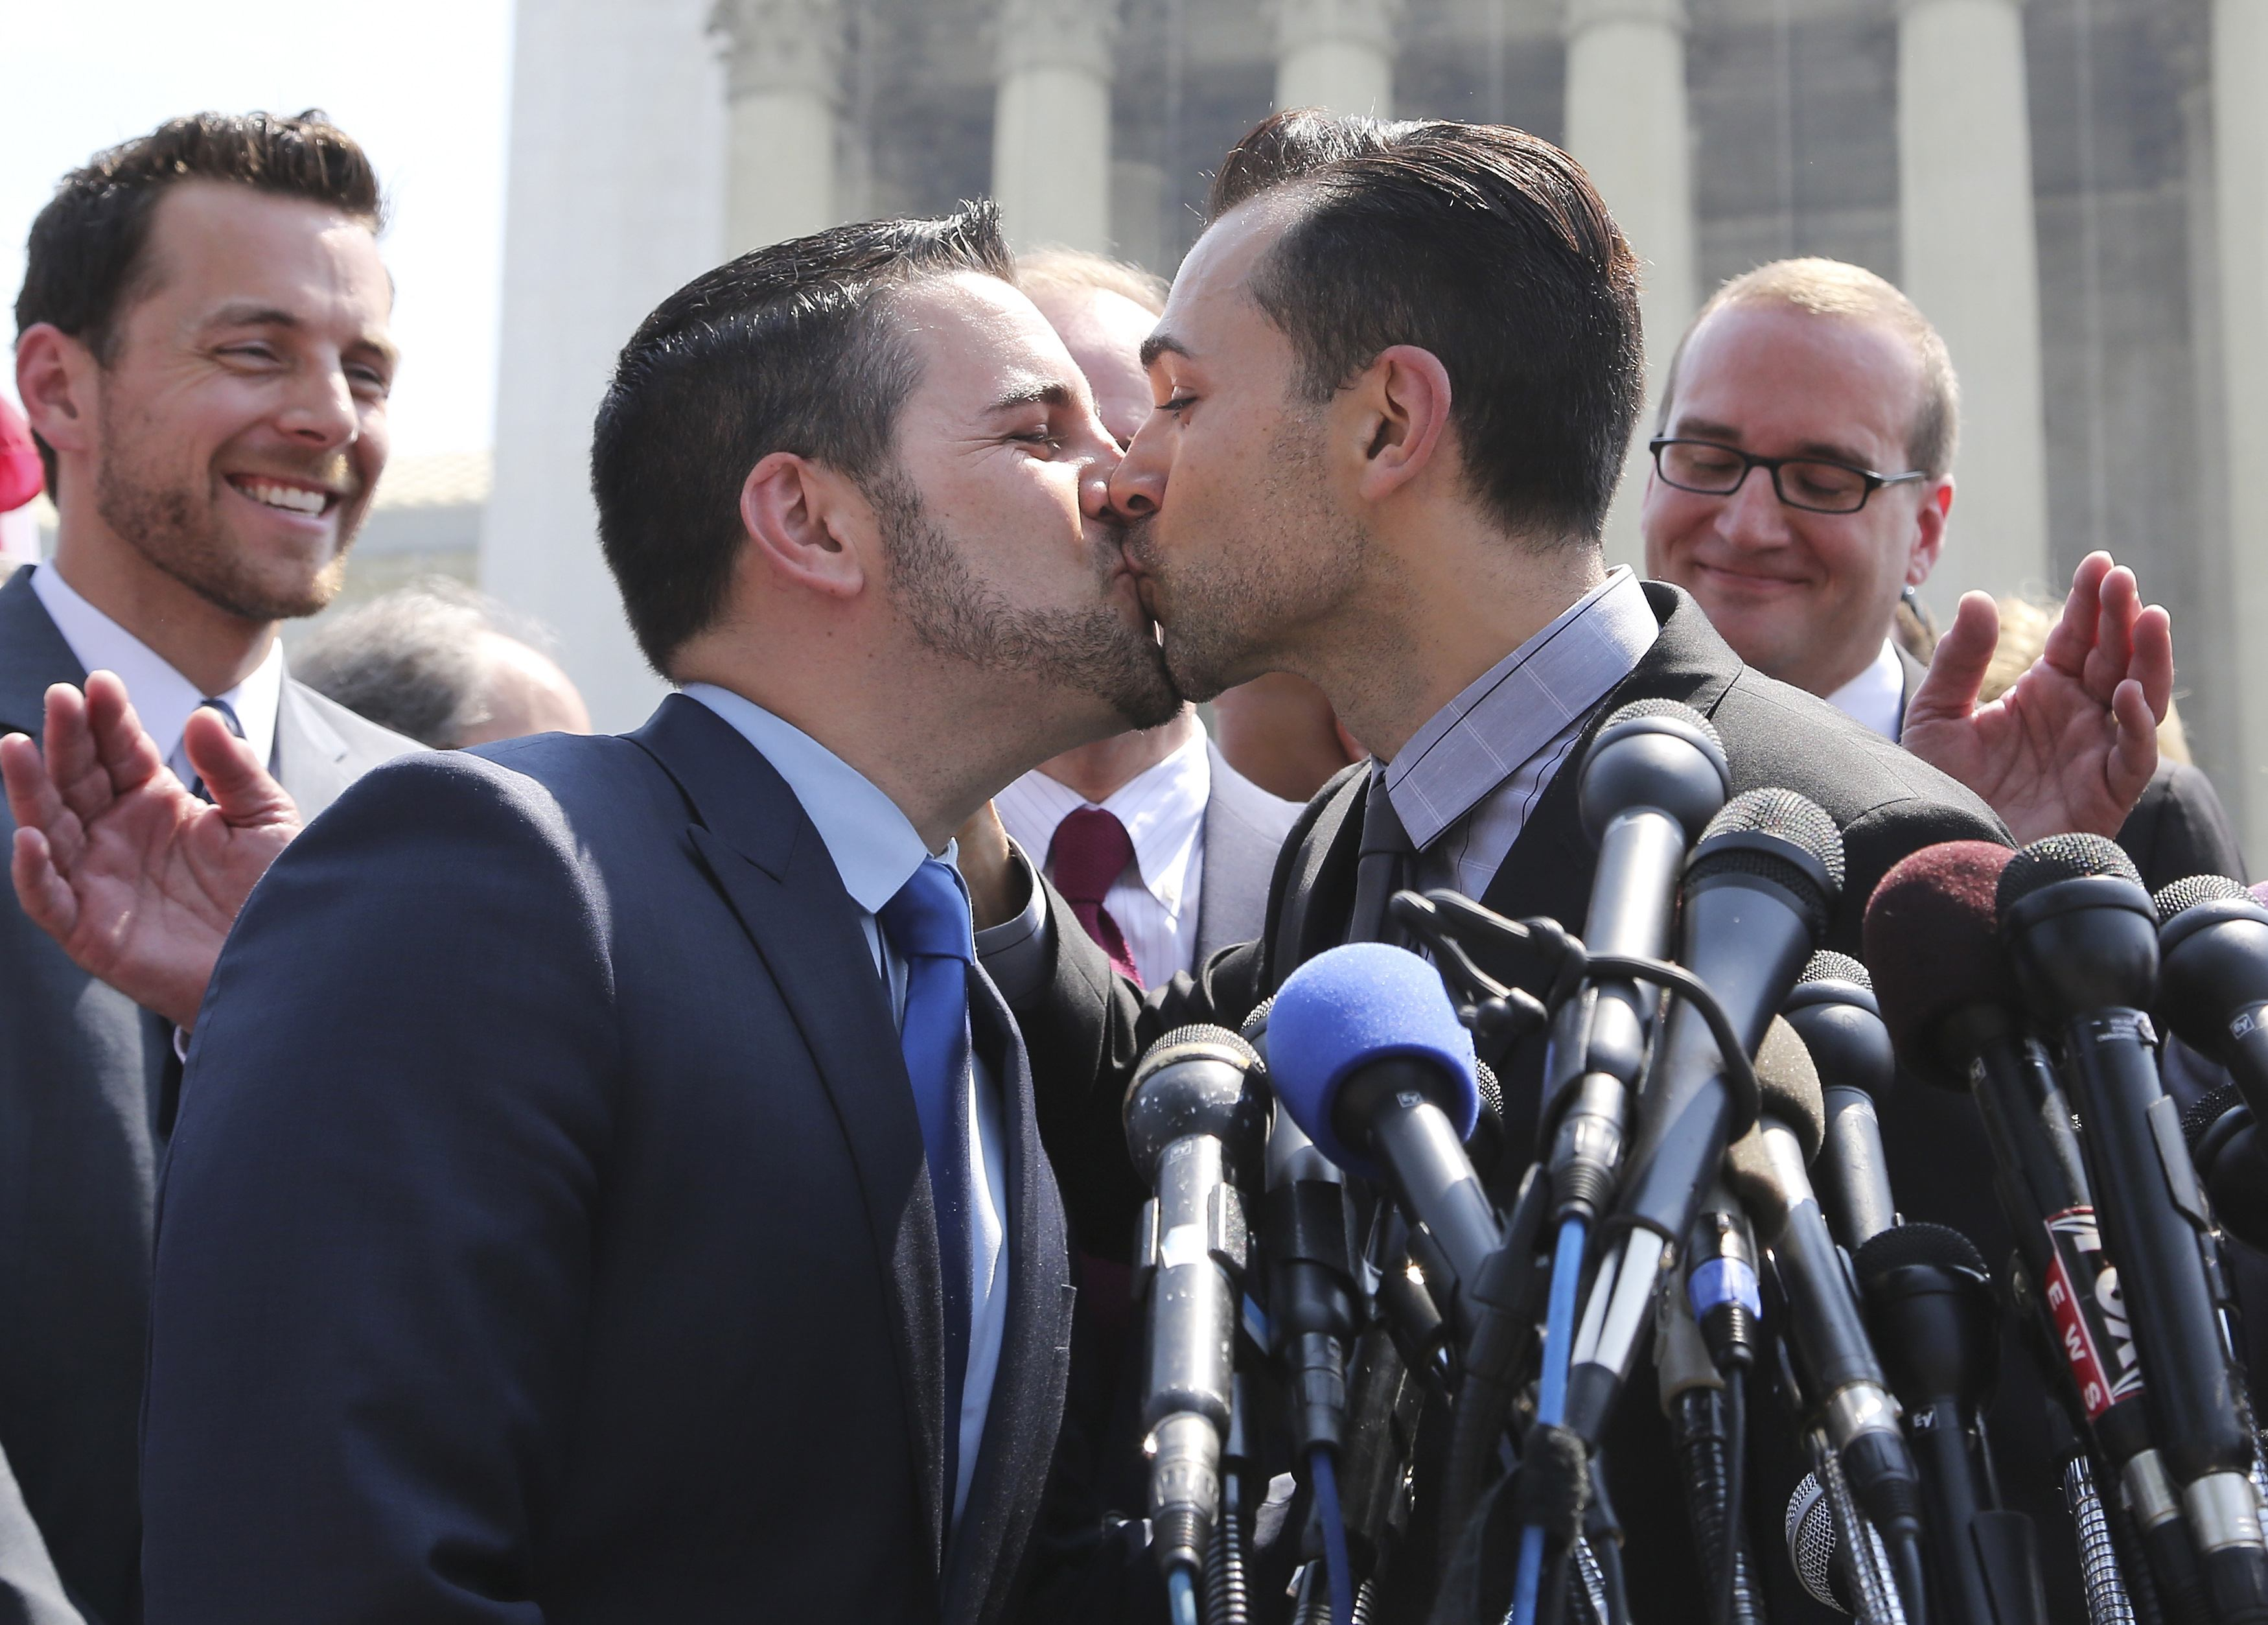 Alabama Eşcinsel Evlilik Davasını Kaybetti Tazminat Yolda!